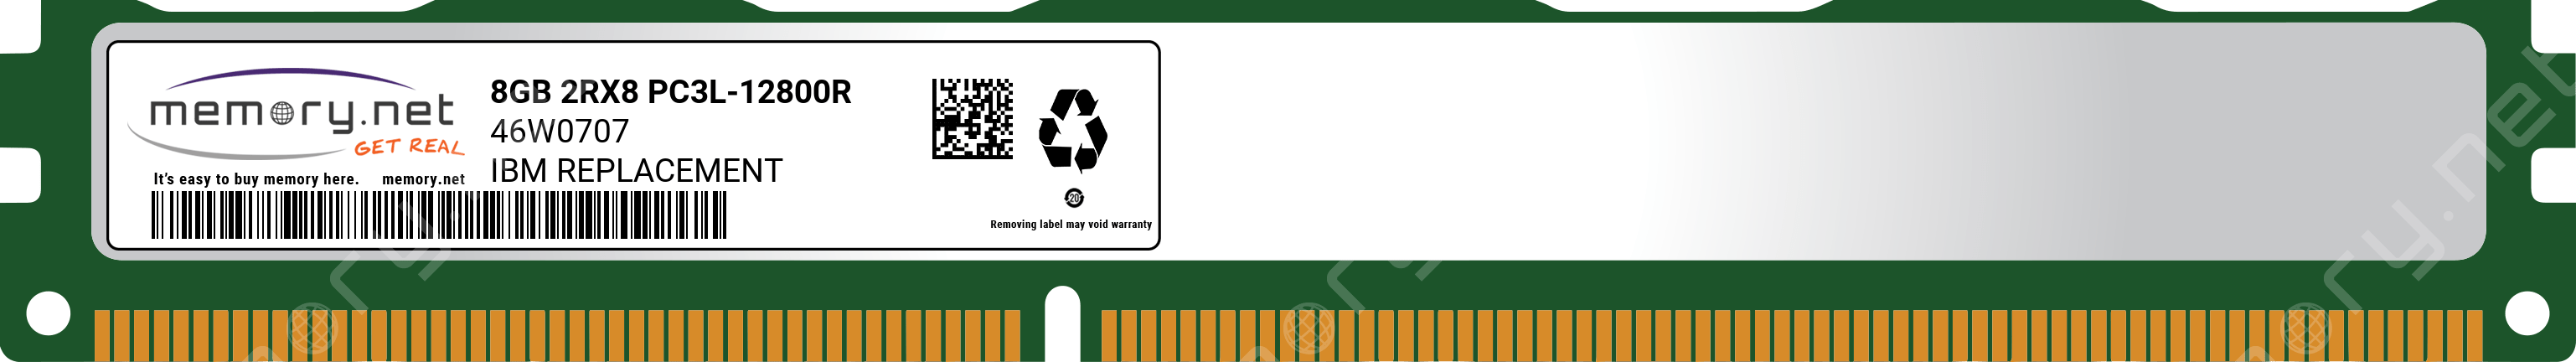 46W0707